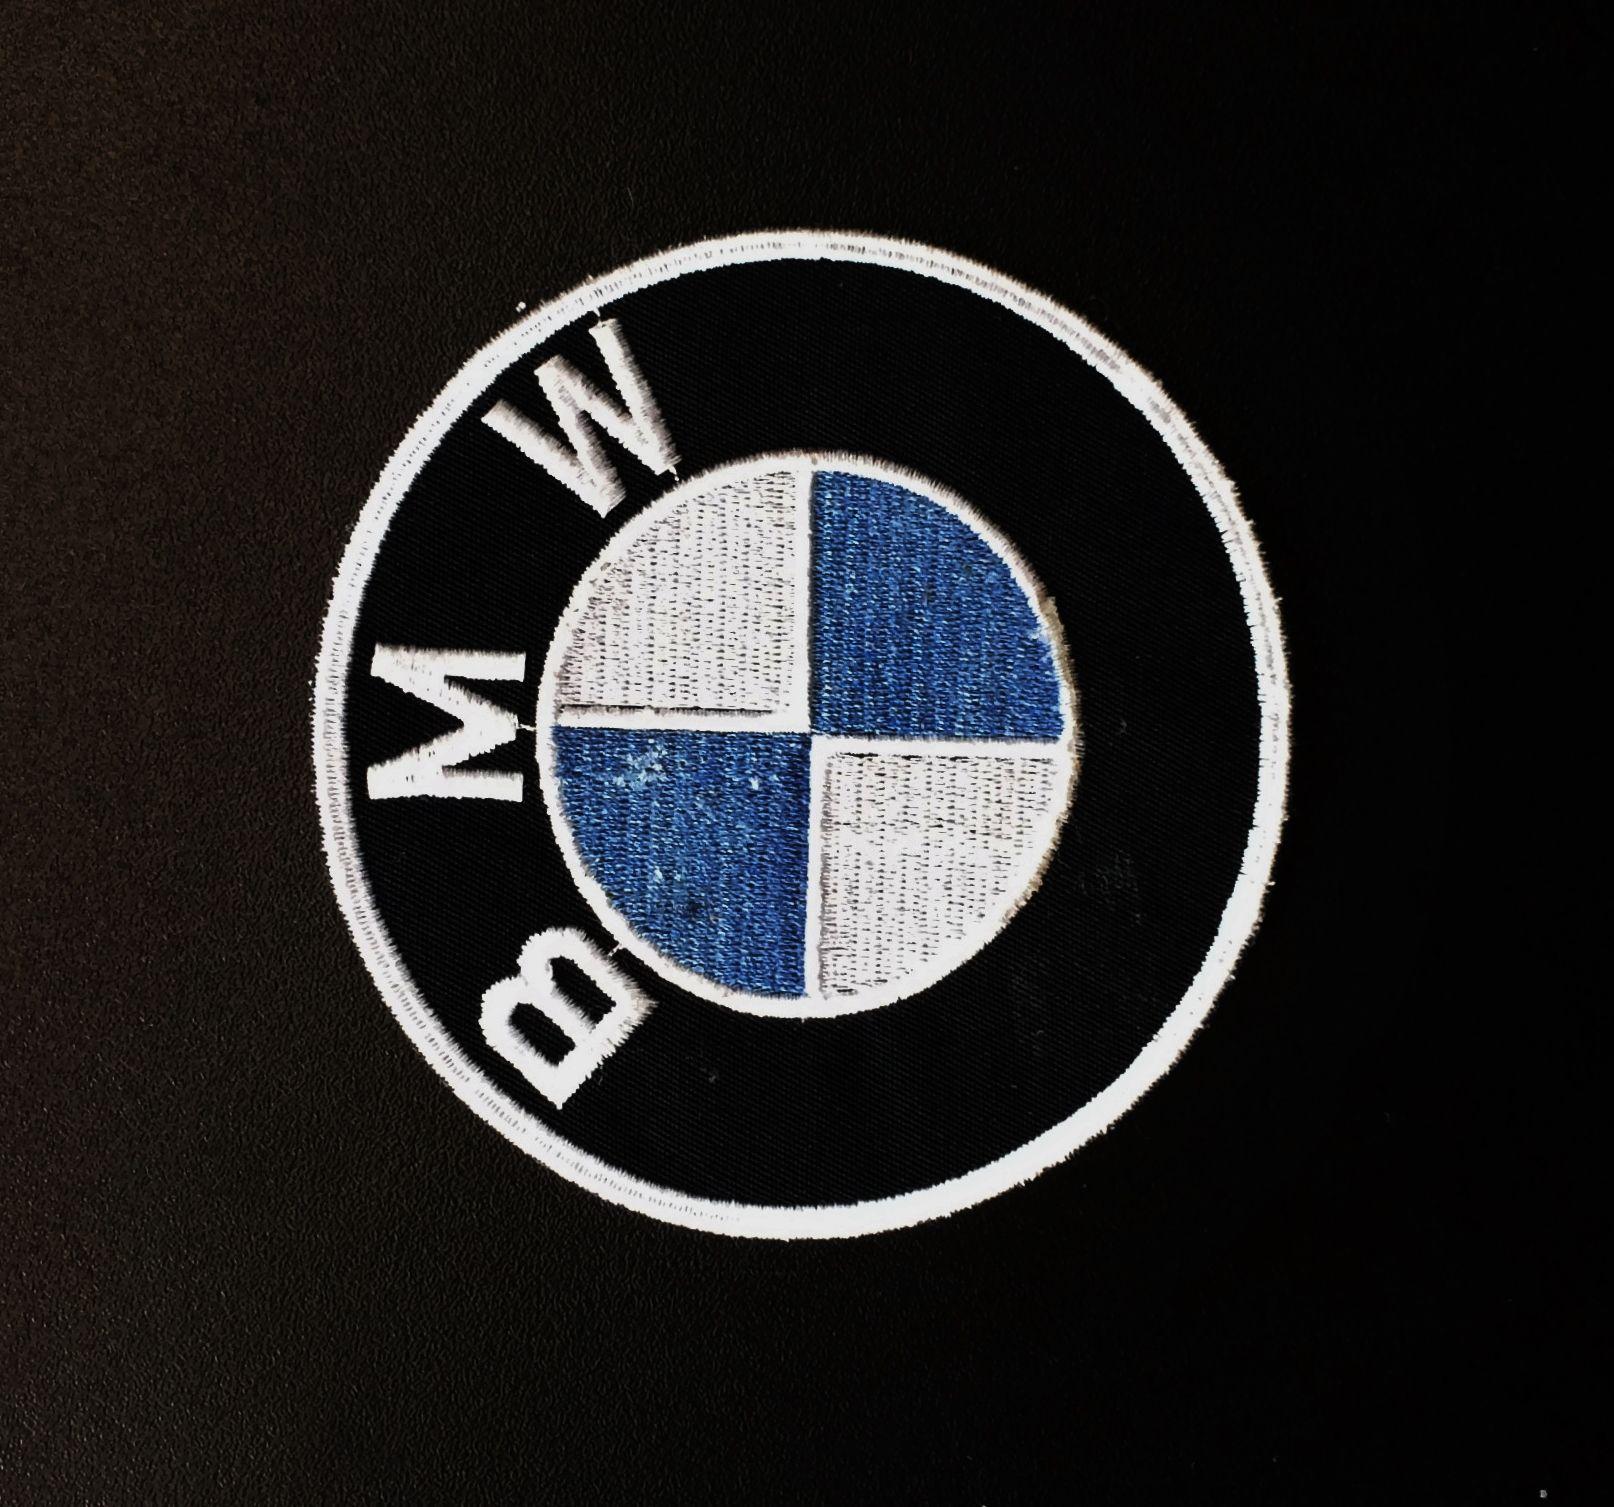 Wolfcraft 1787000 20 Patins Abrasifs Auto-agrippants Delta 105 Mm Perfor/és 120 240 Corindon Grains Assortis 60